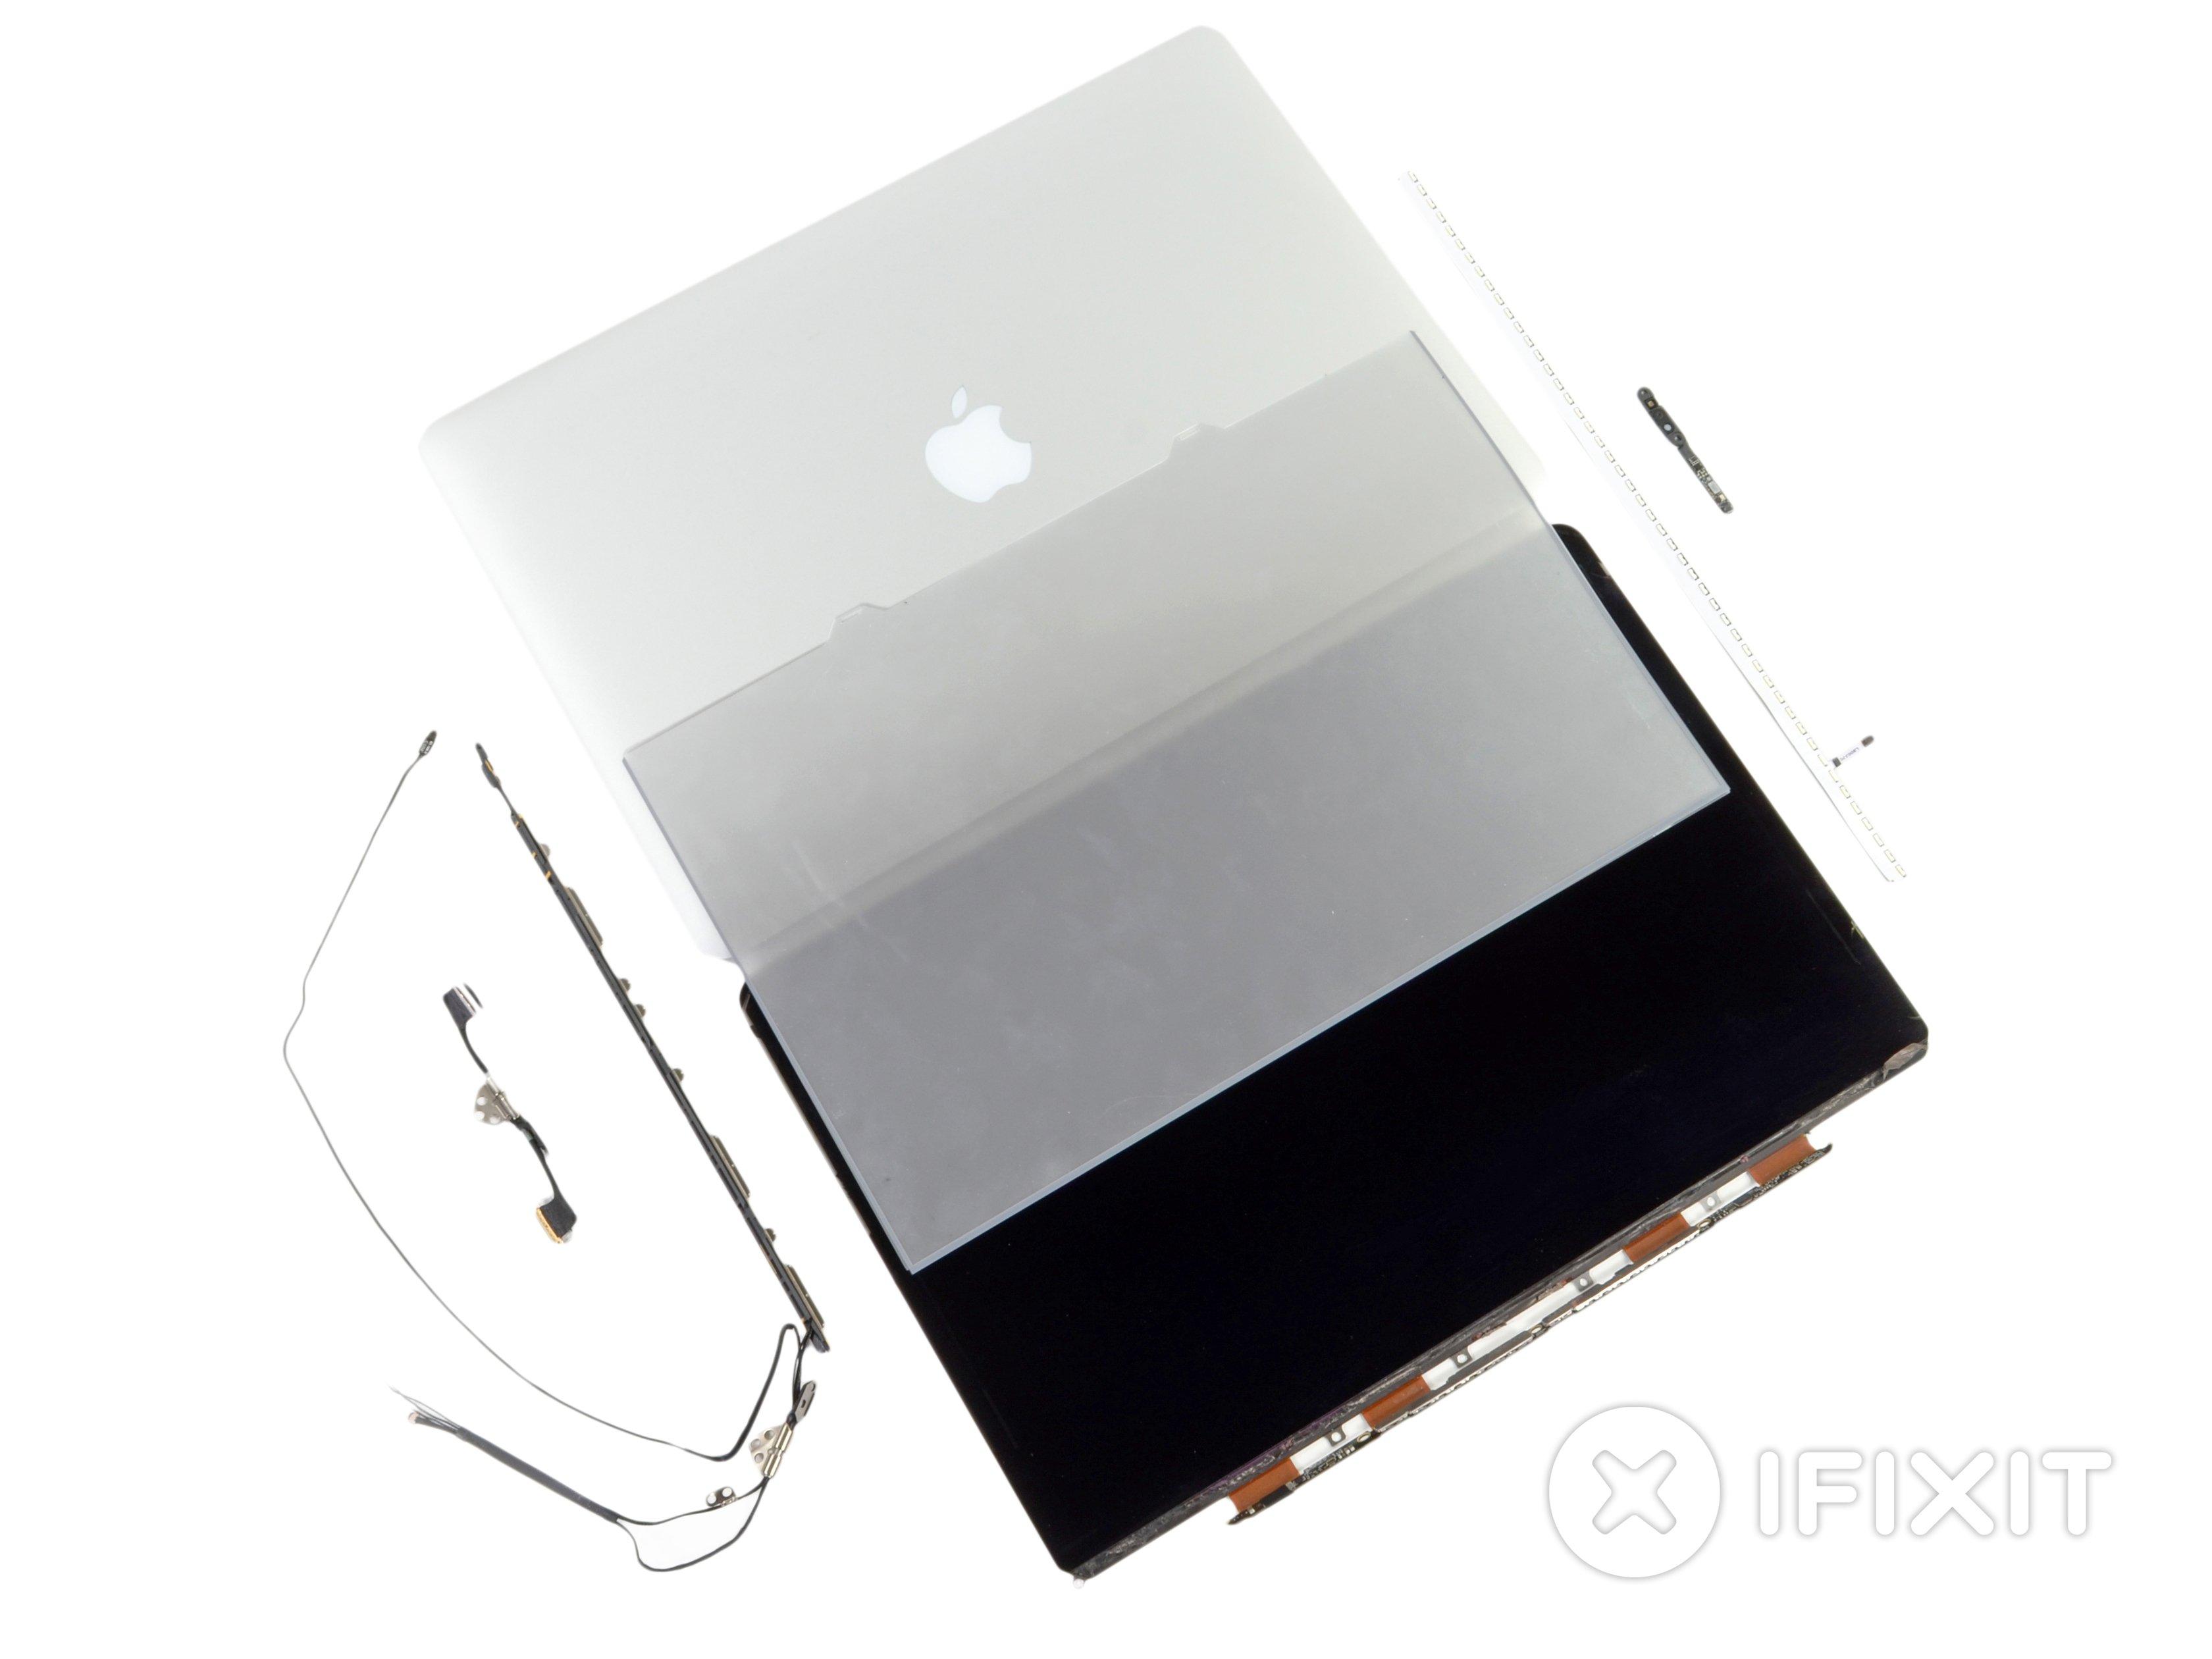 Macbook Pro Retina Display Teardown Ifixit